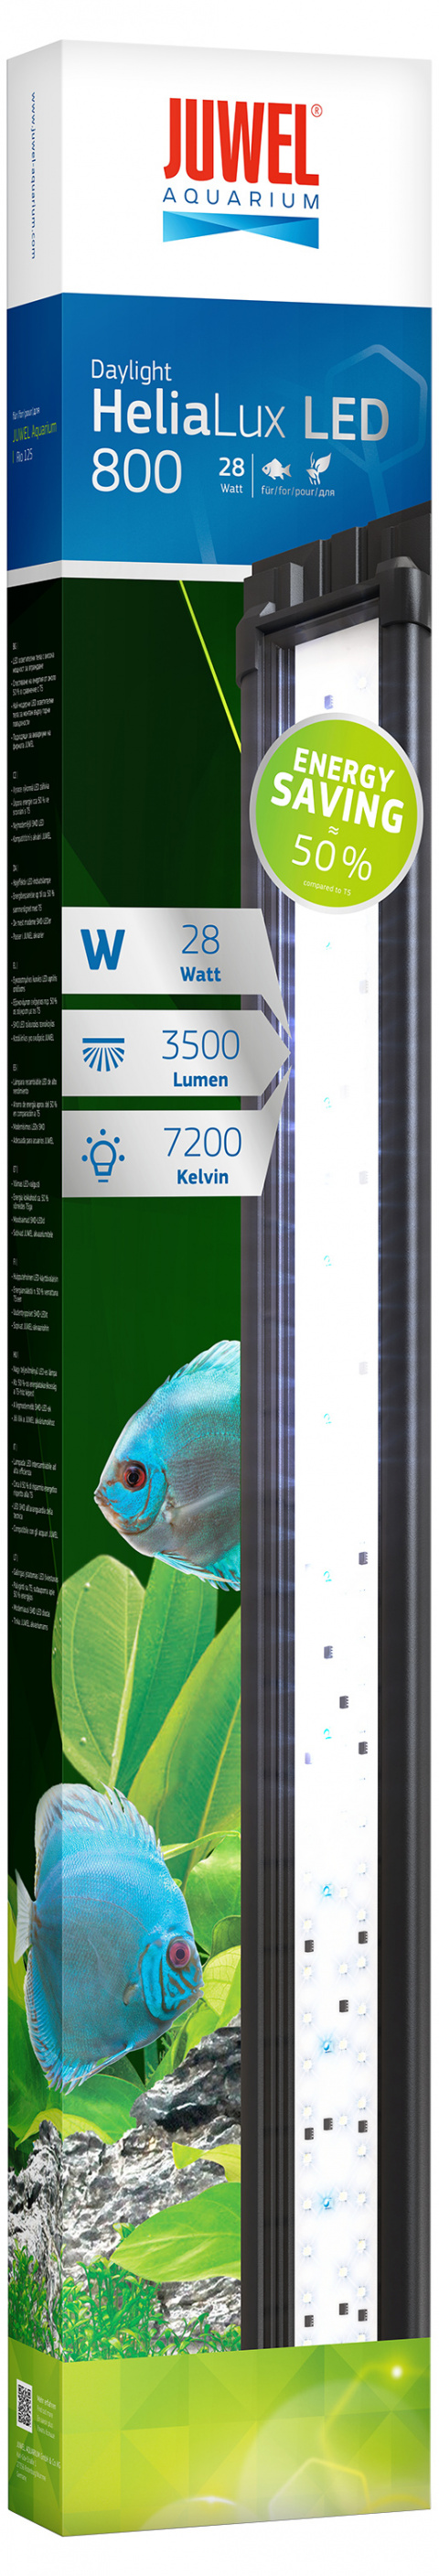 Dienas gaisma akvārijam - Juwel Helia Lux LED 800, 28 W